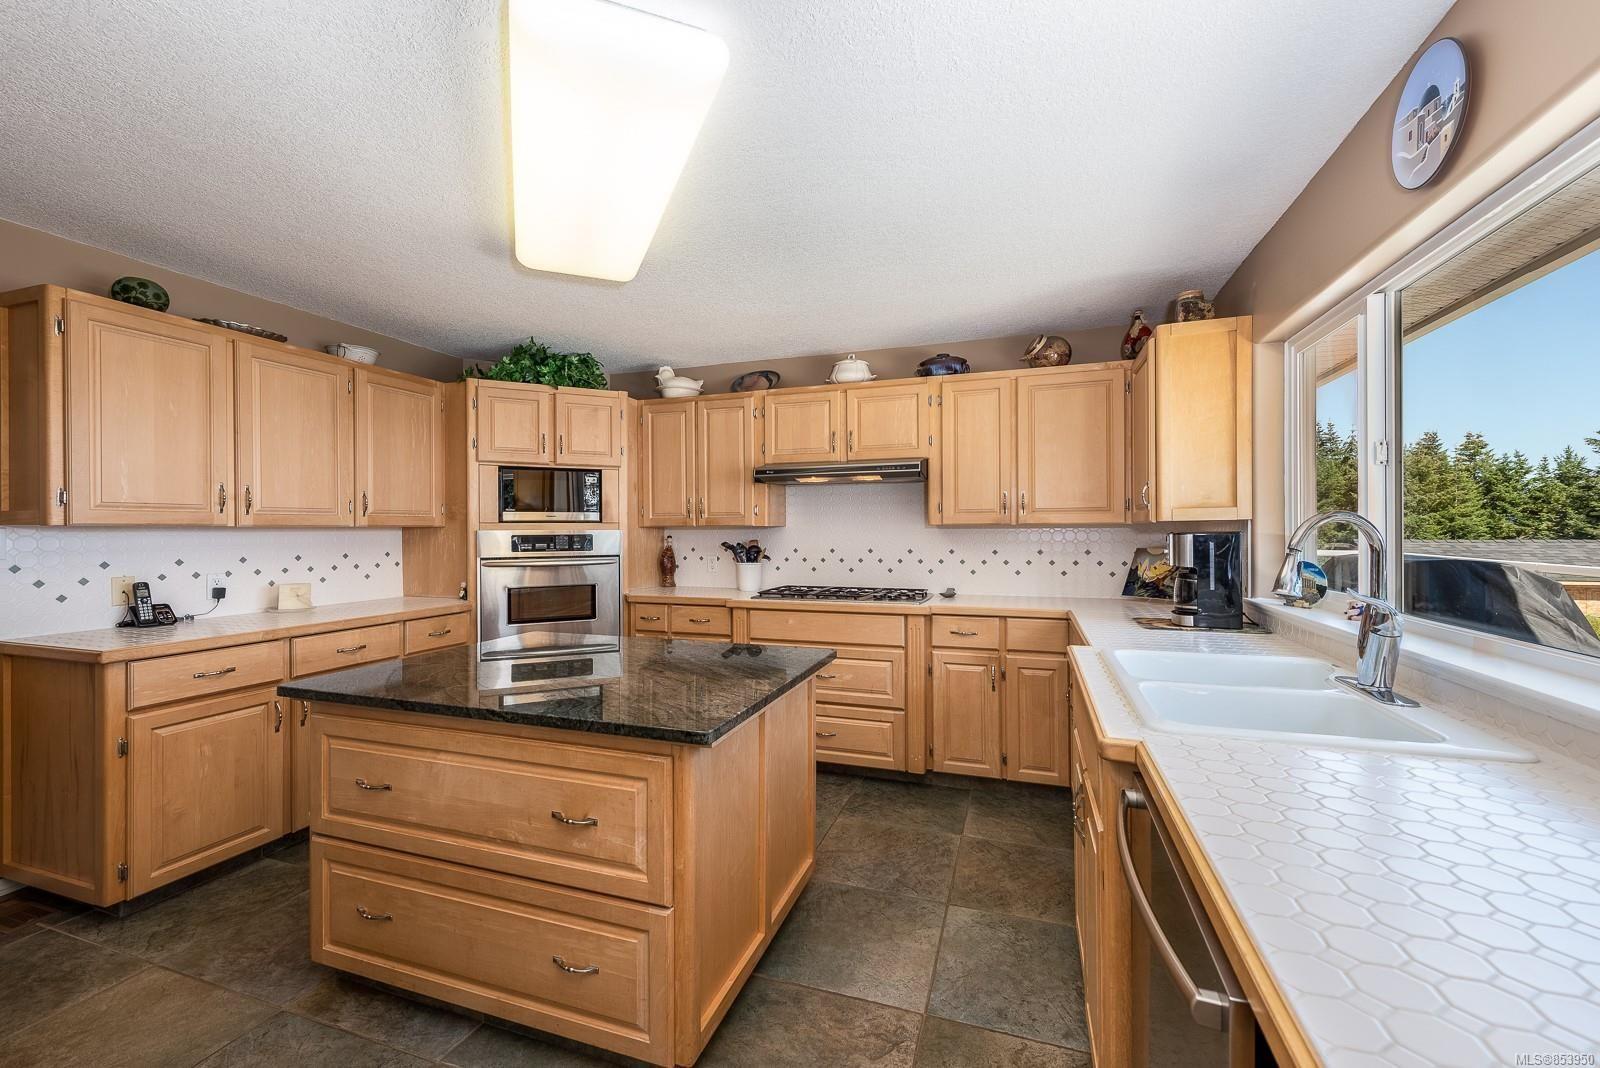 Photo 14: Photos: 5880 GARVIN Rd in : CV Union Bay/Fanny Bay House for sale (Comox Valley)  : MLS®# 853950